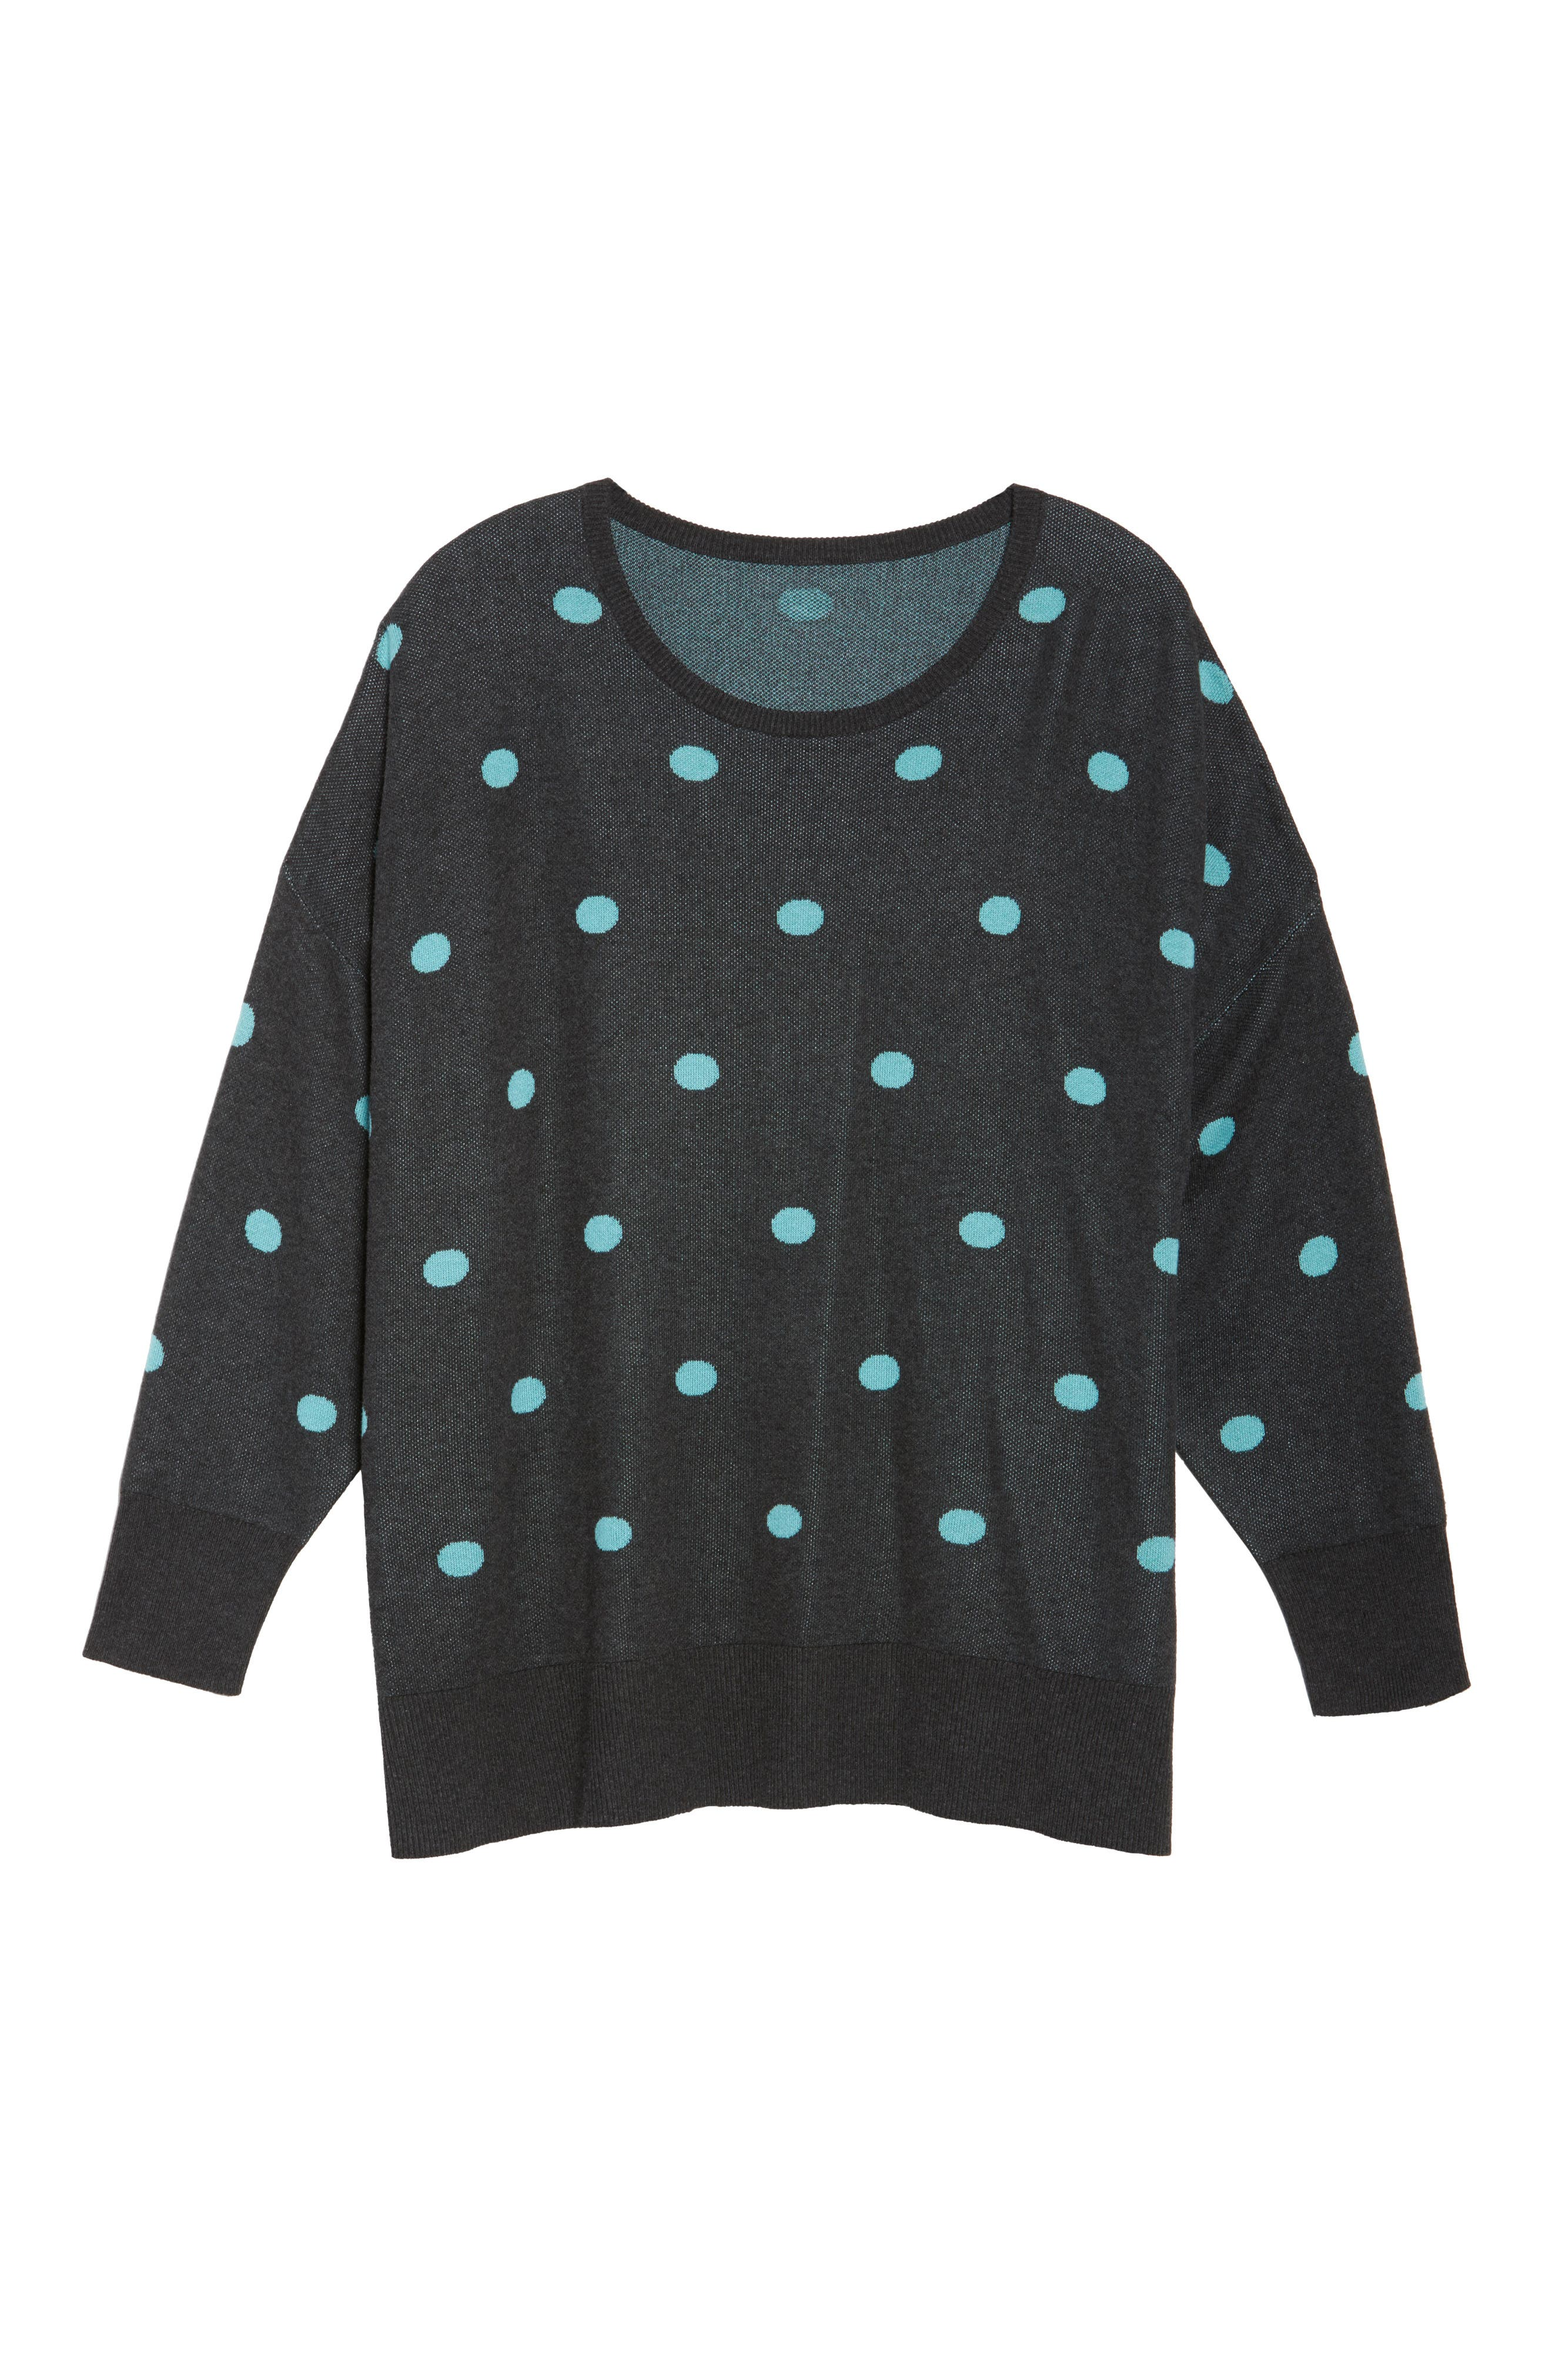 Dolman Sleeve Crewneck Sweater,                             Alternate thumbnail 6, color,                             Grey- Blue Dots Pattern